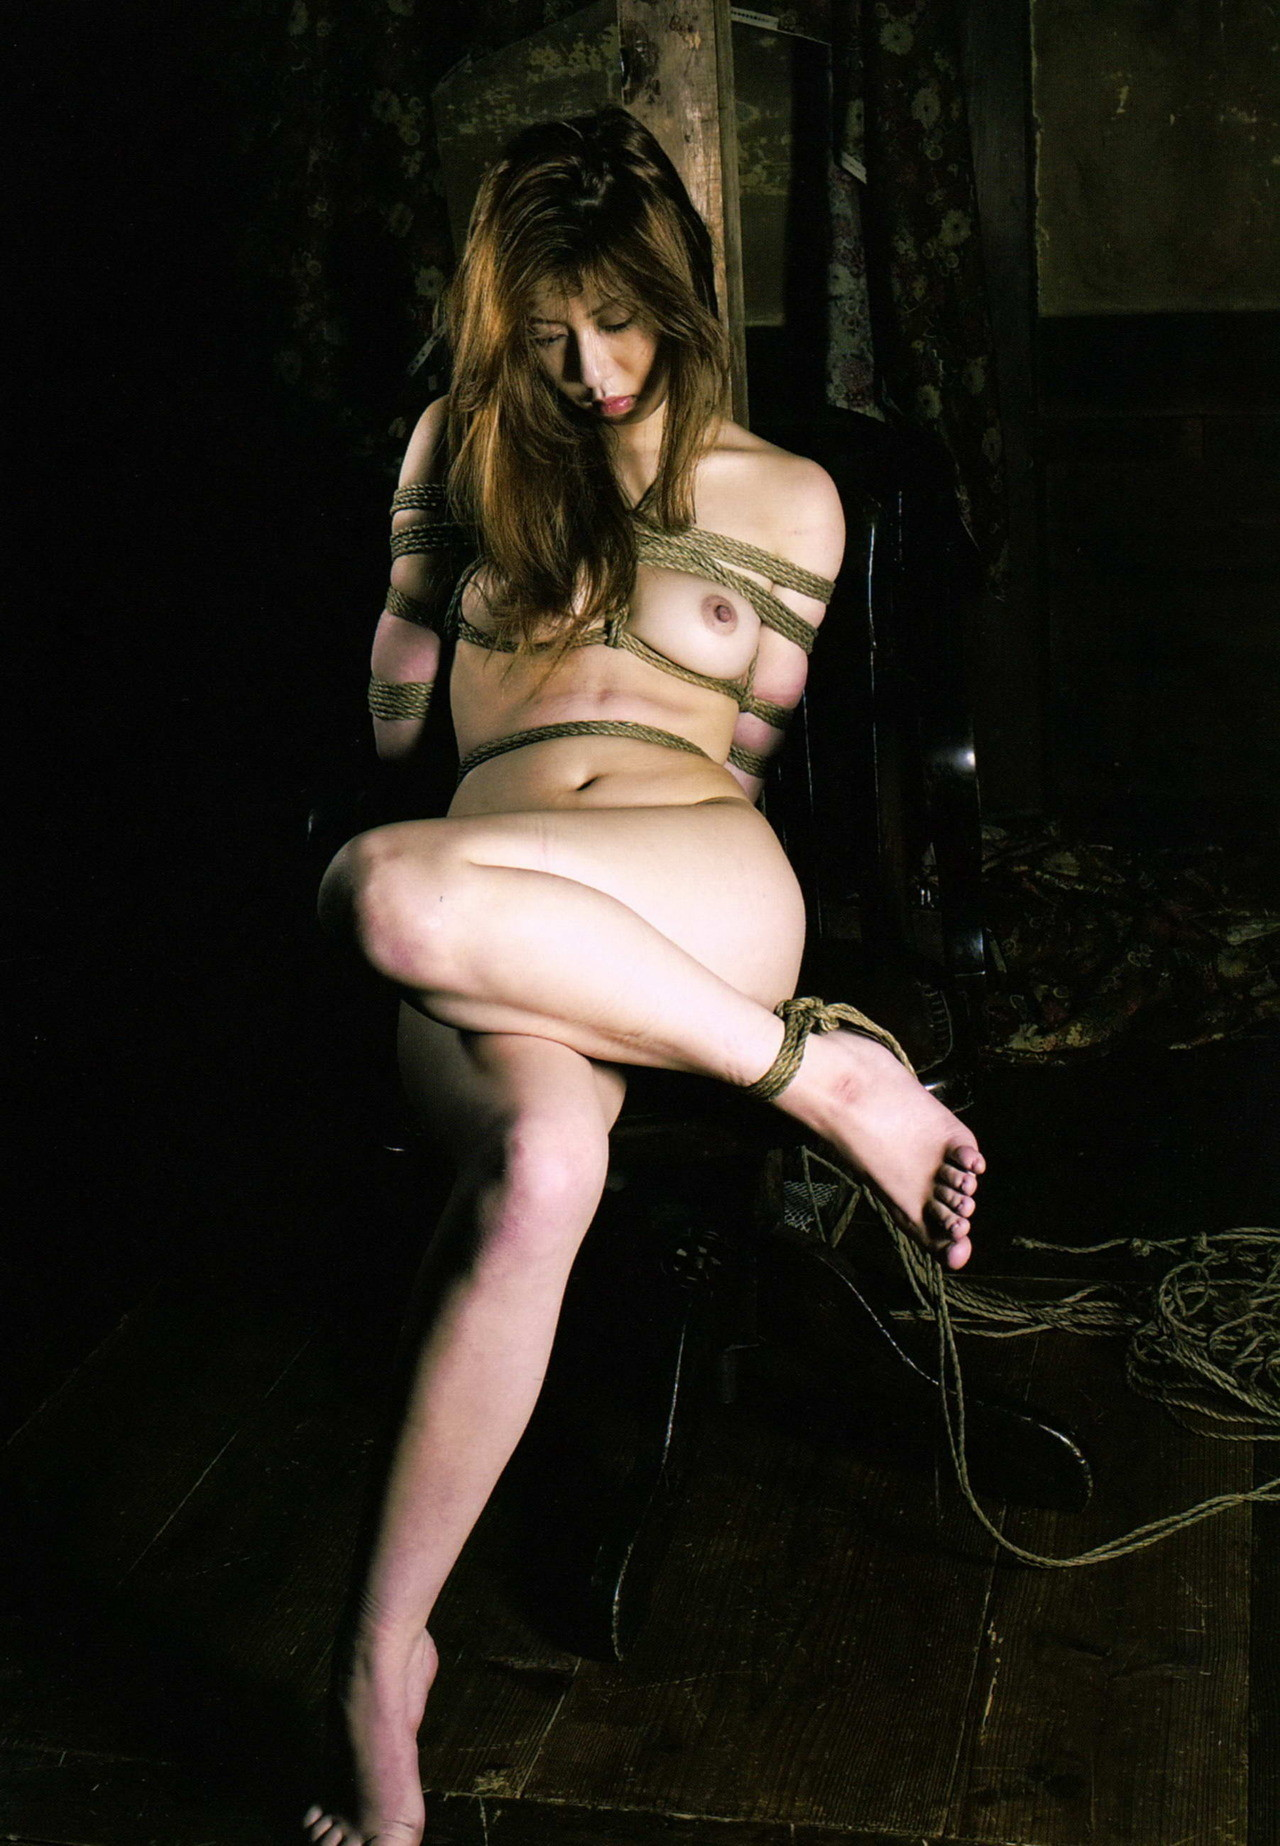 【SMエロ画像】解くの勿体ないほど卑猥で芸術的な女体緊縛の図www 08